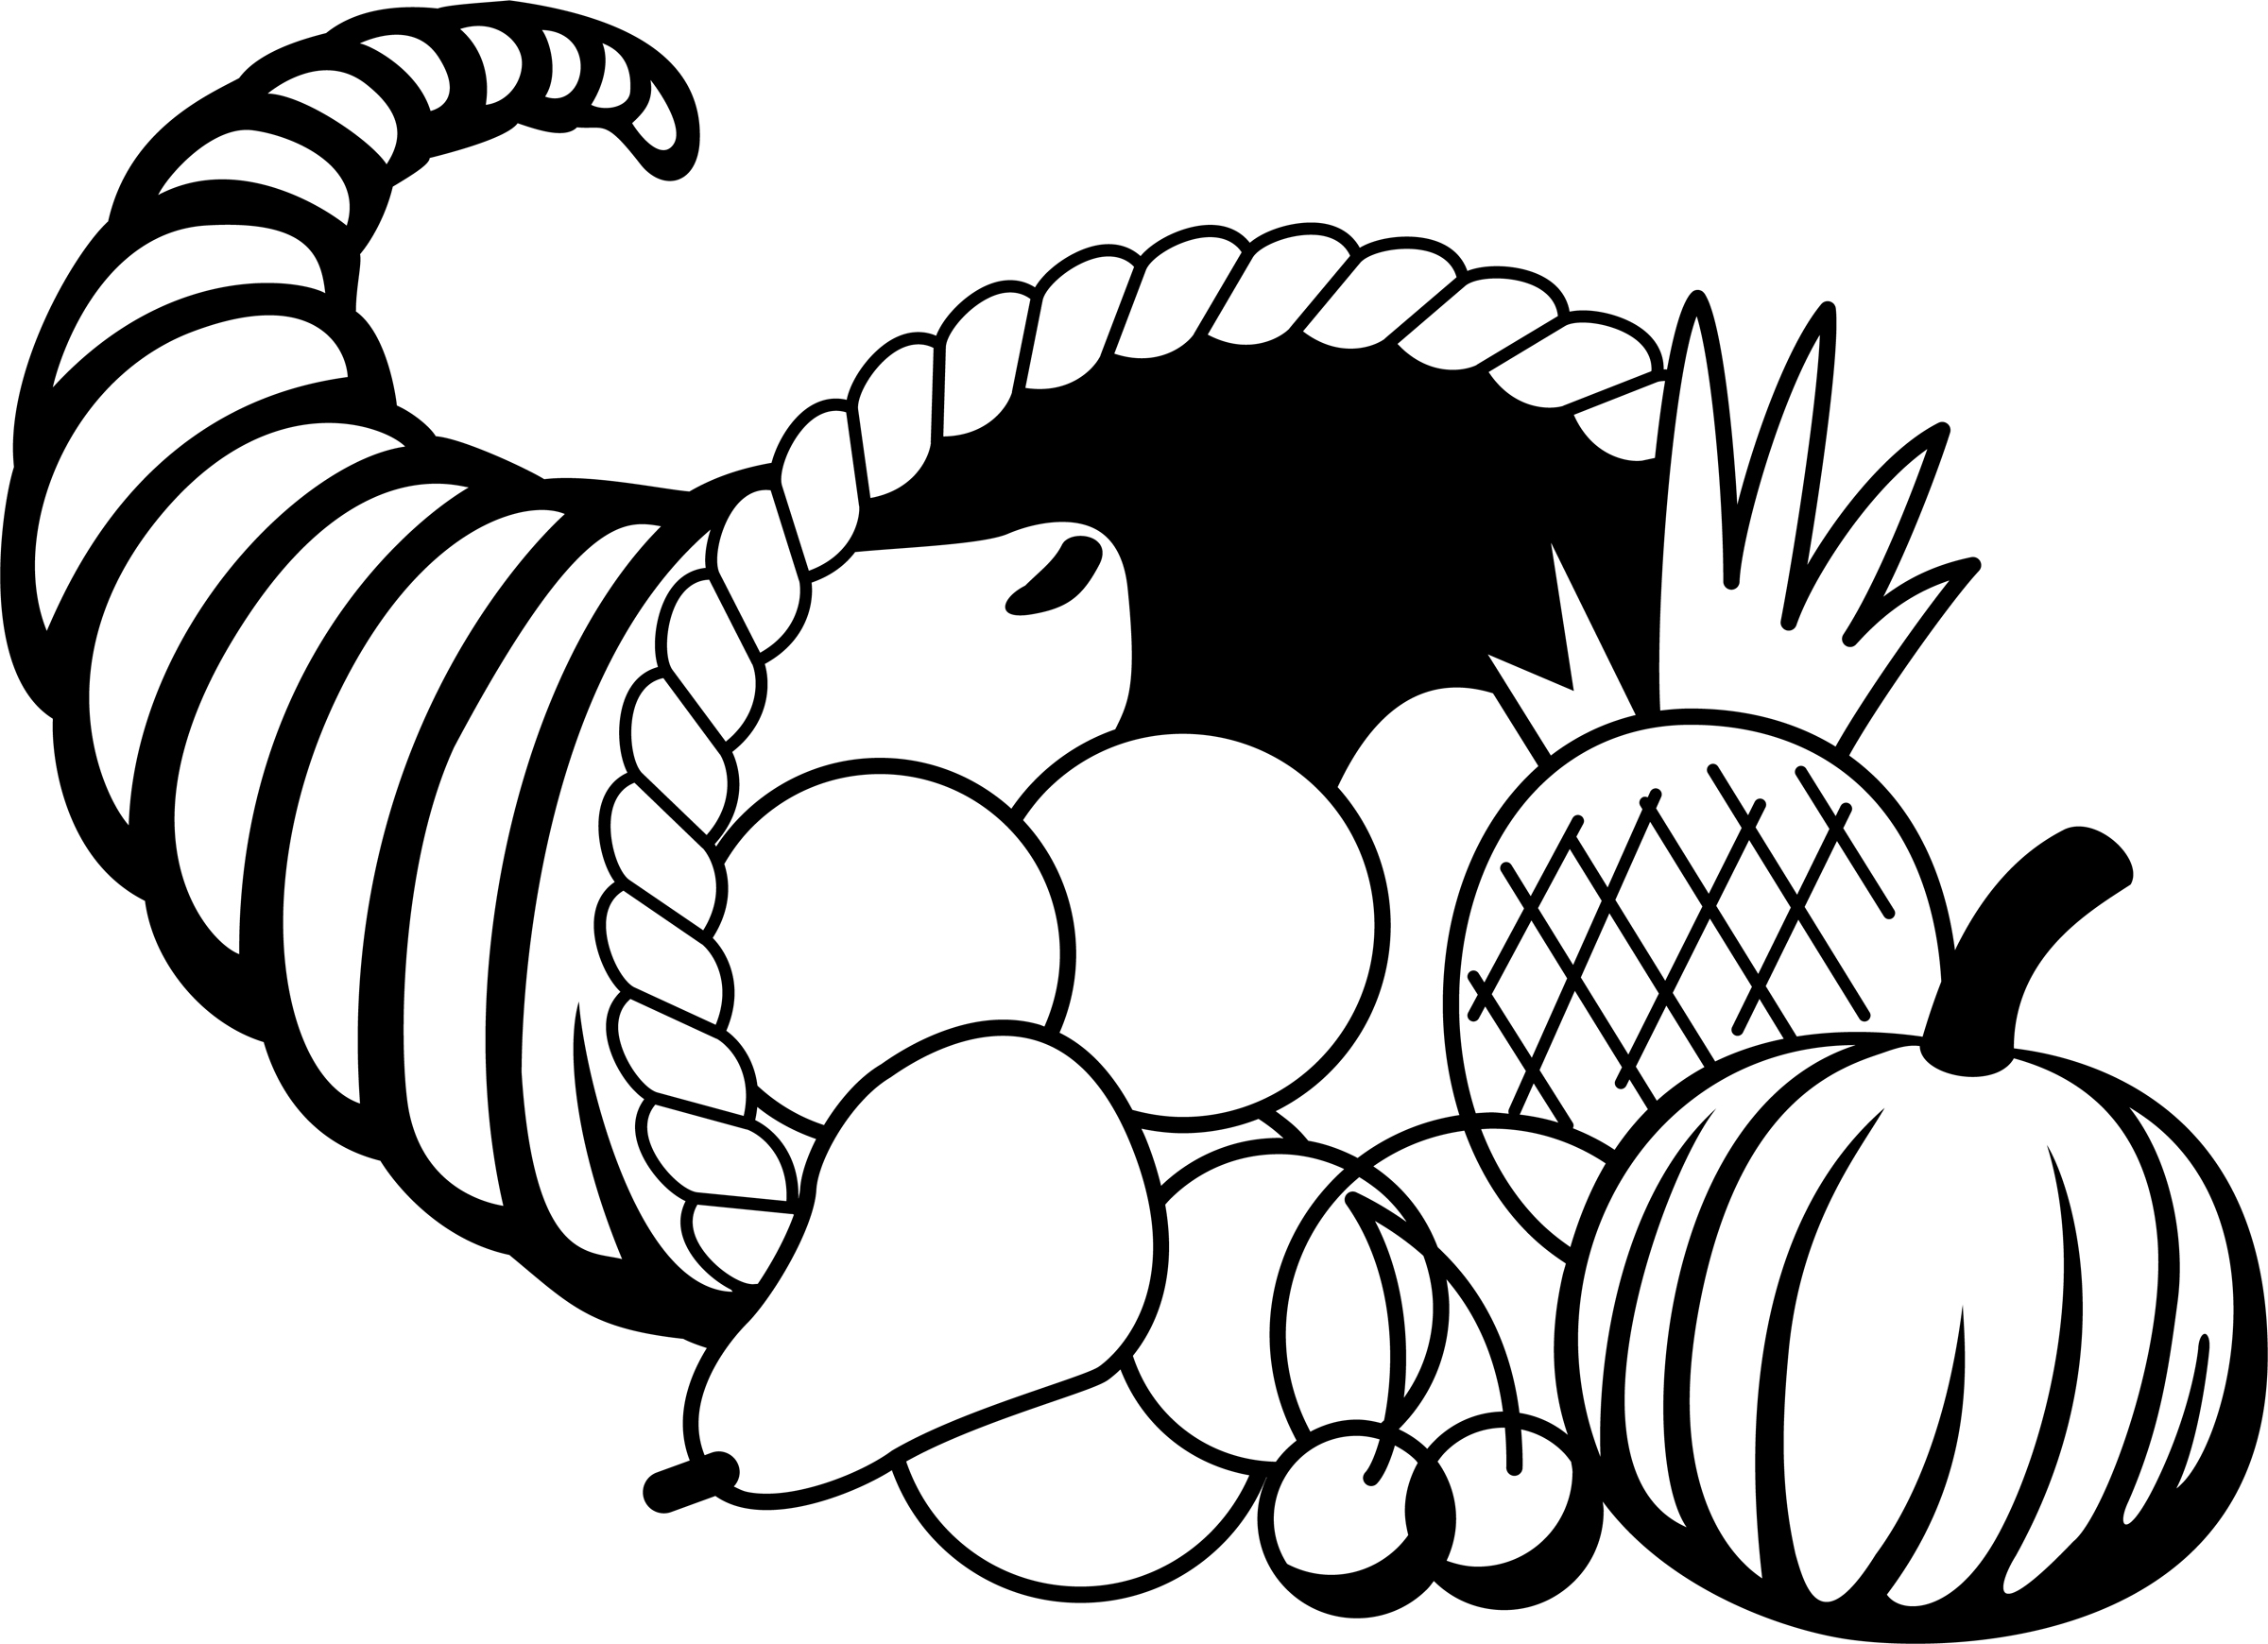 Cornucopia Clip Art - Thanksgiving Clip Art Black And White